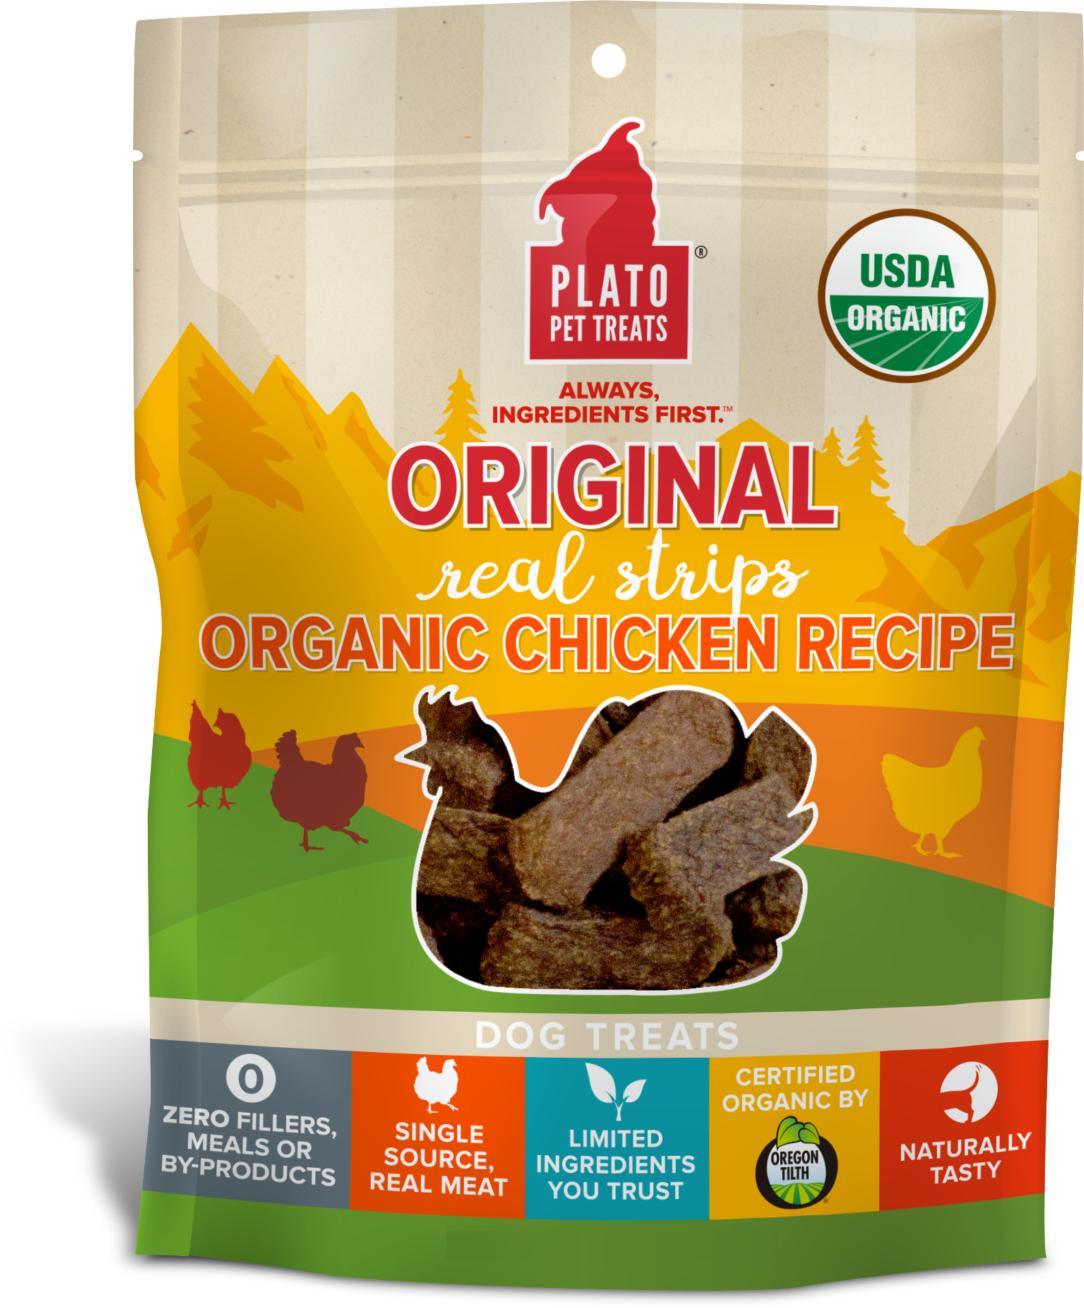 Plato Original Real Strips Organic Chicken Recipe Dog Treats Image